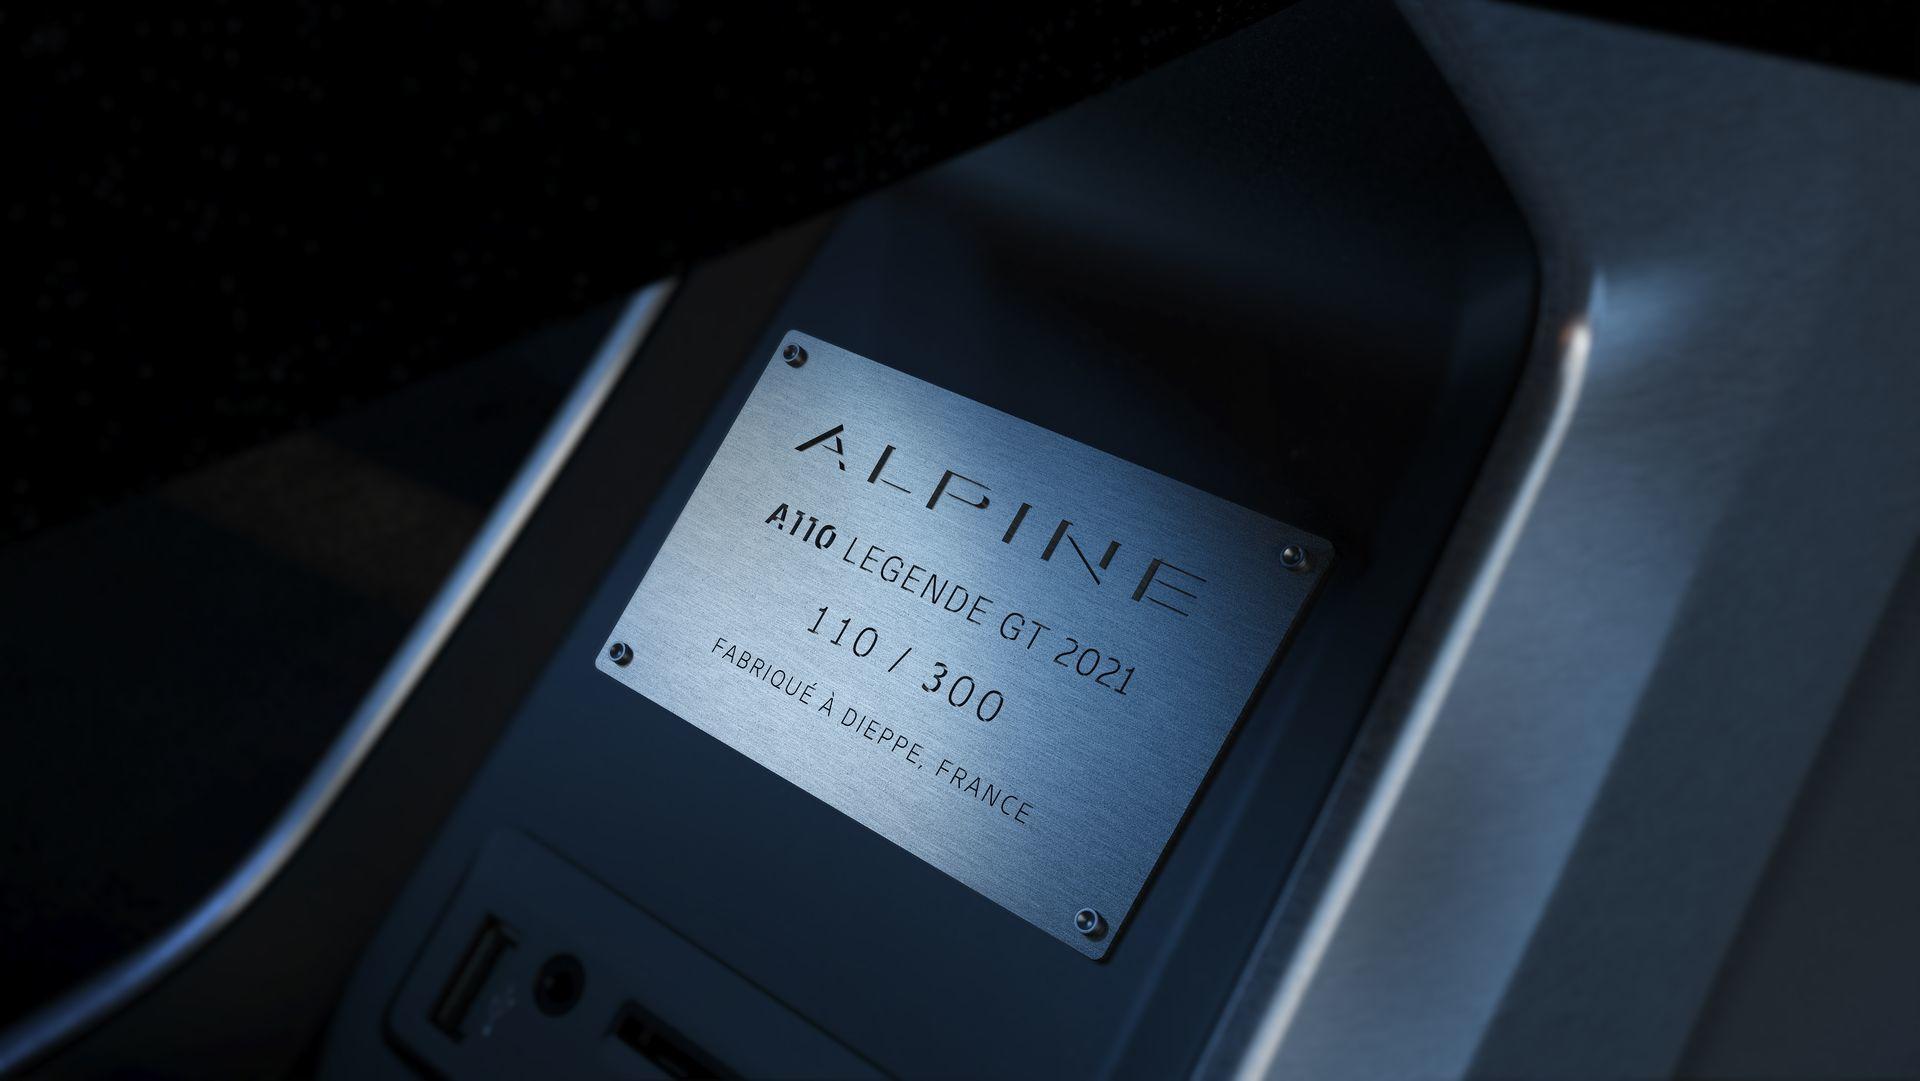 Alpine A110 Legende Gt